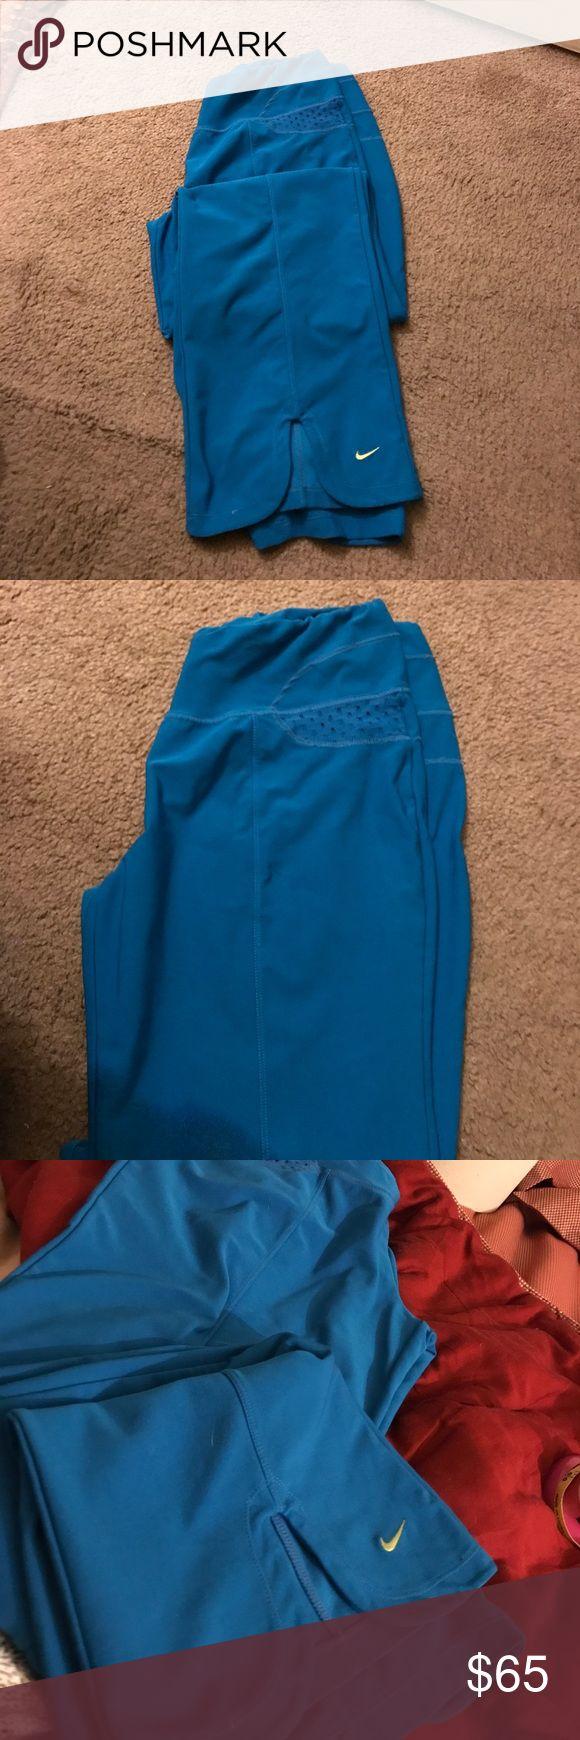 Nike Sea Blue Yoga pants Size Large excellent condition pants. Super comfy. Stretch Lycra legging material Nike Pants Track Pants & Joggers